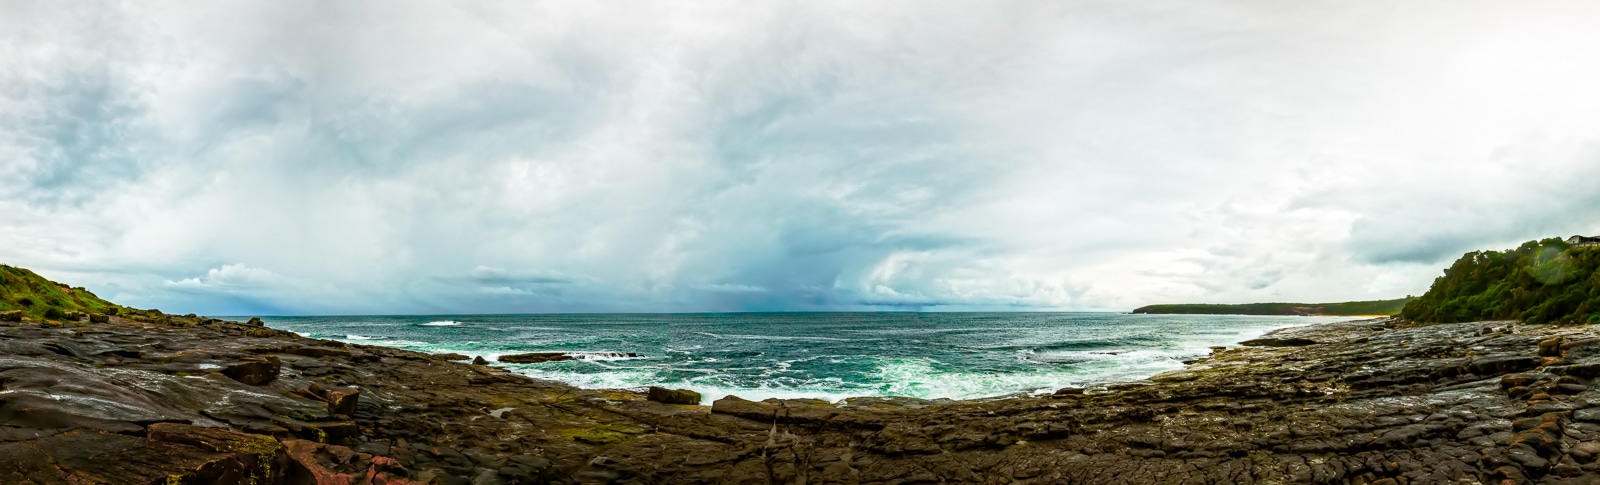 Rocky Merimbula coastline